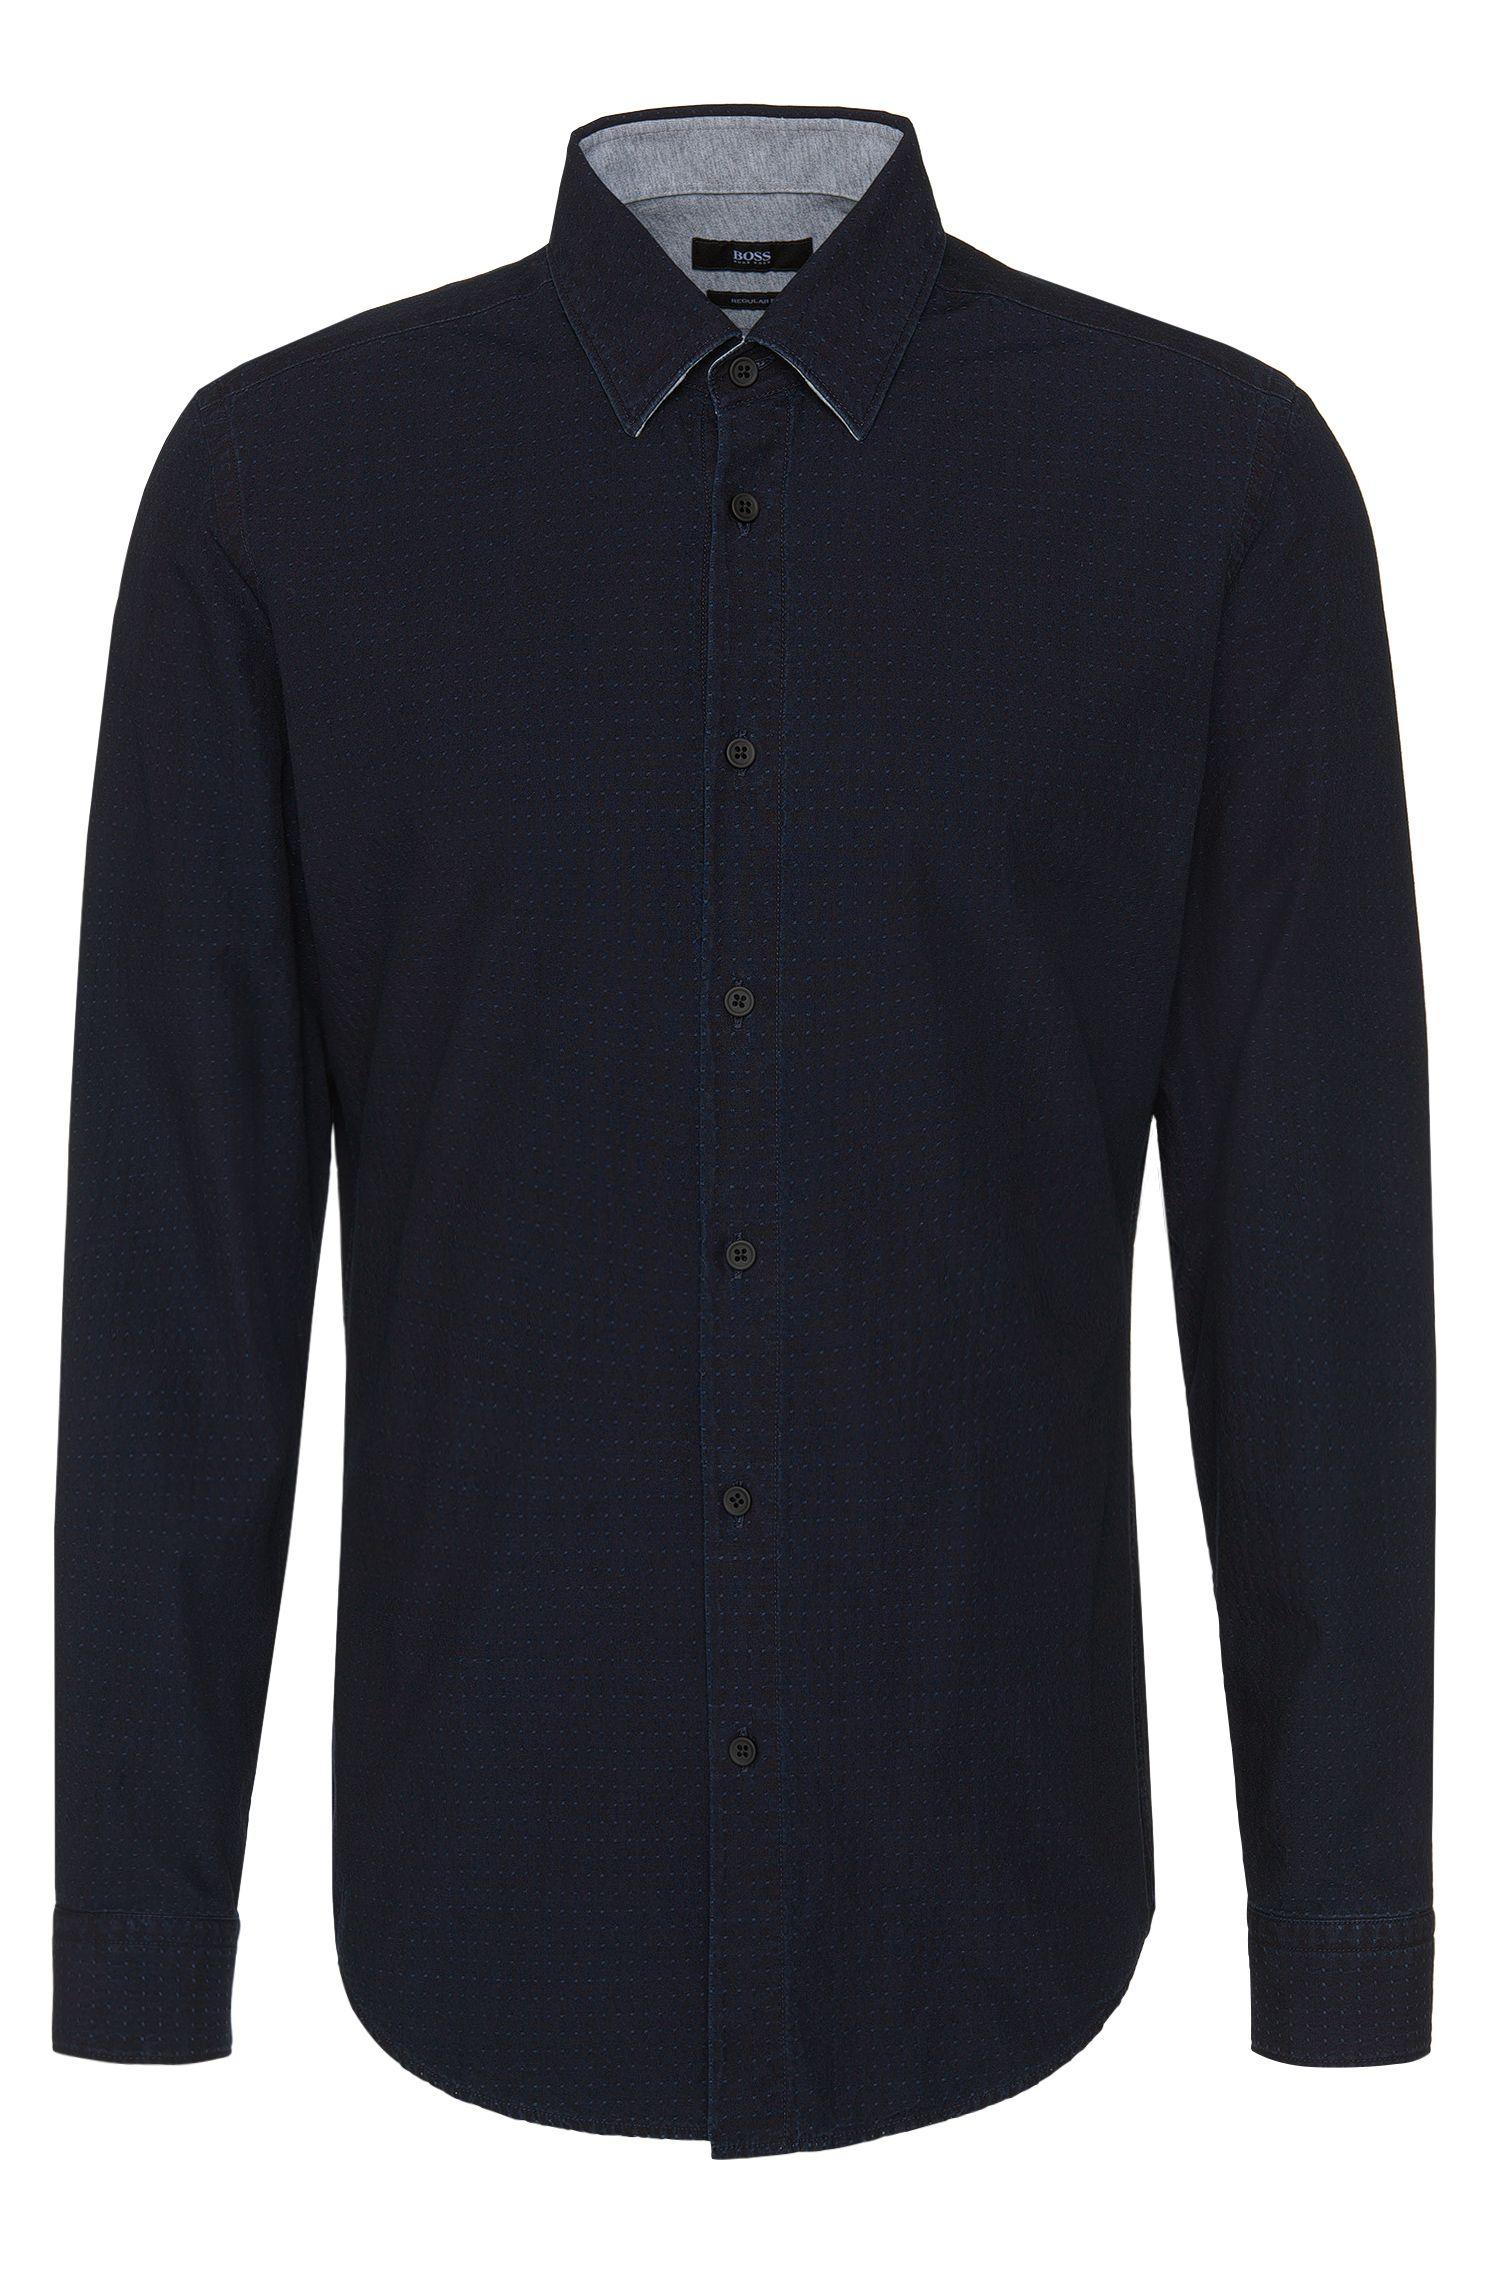 'Loreno' | Regular Fit, Cotton Embroidered Button Down Shirt